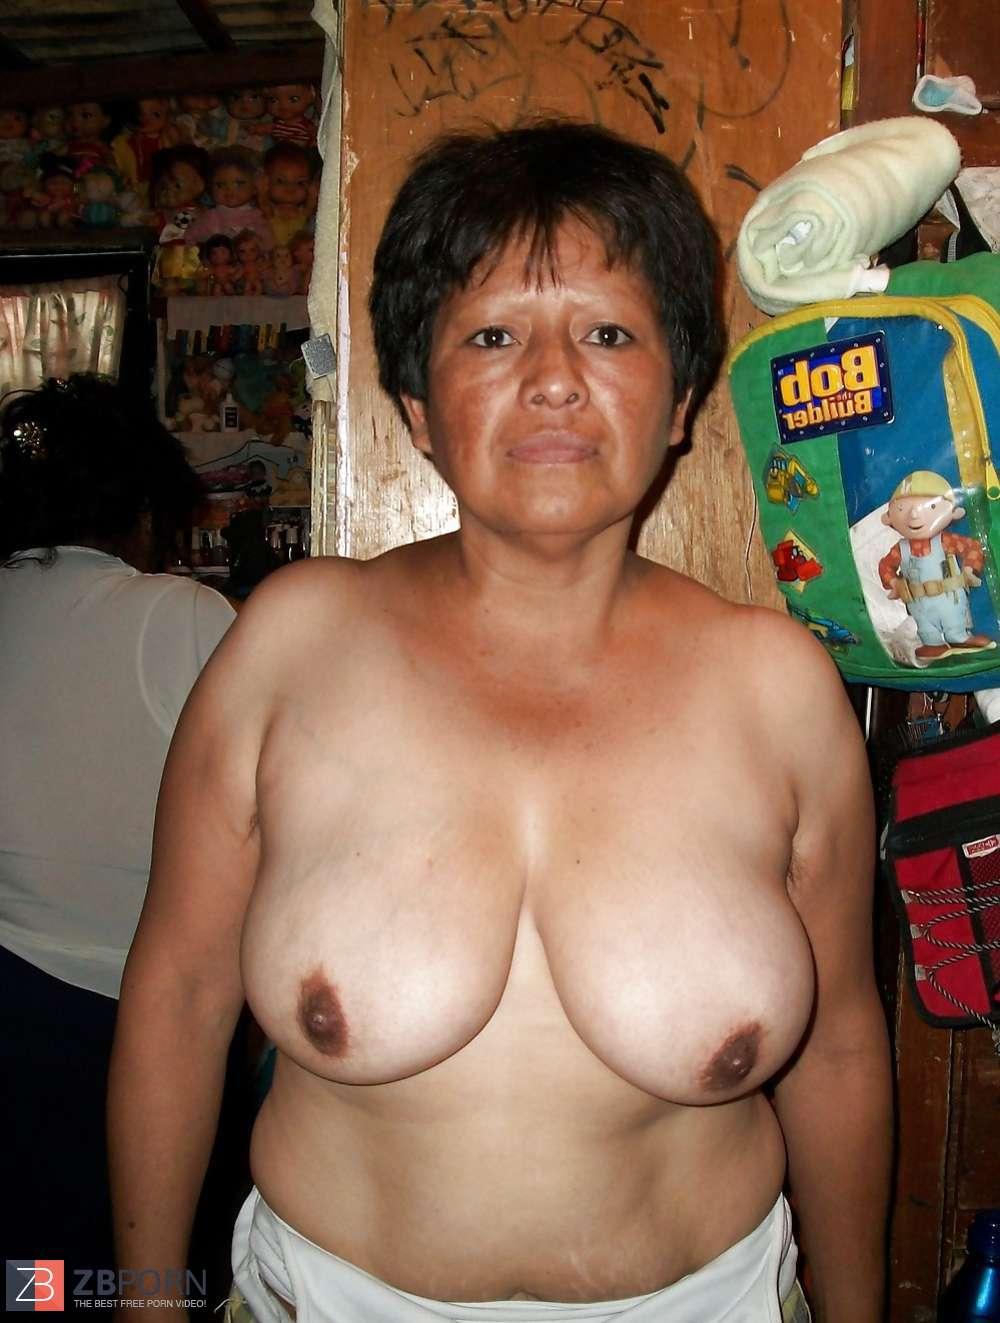 Opinion Maduras mexicanas desnudas apologise, but